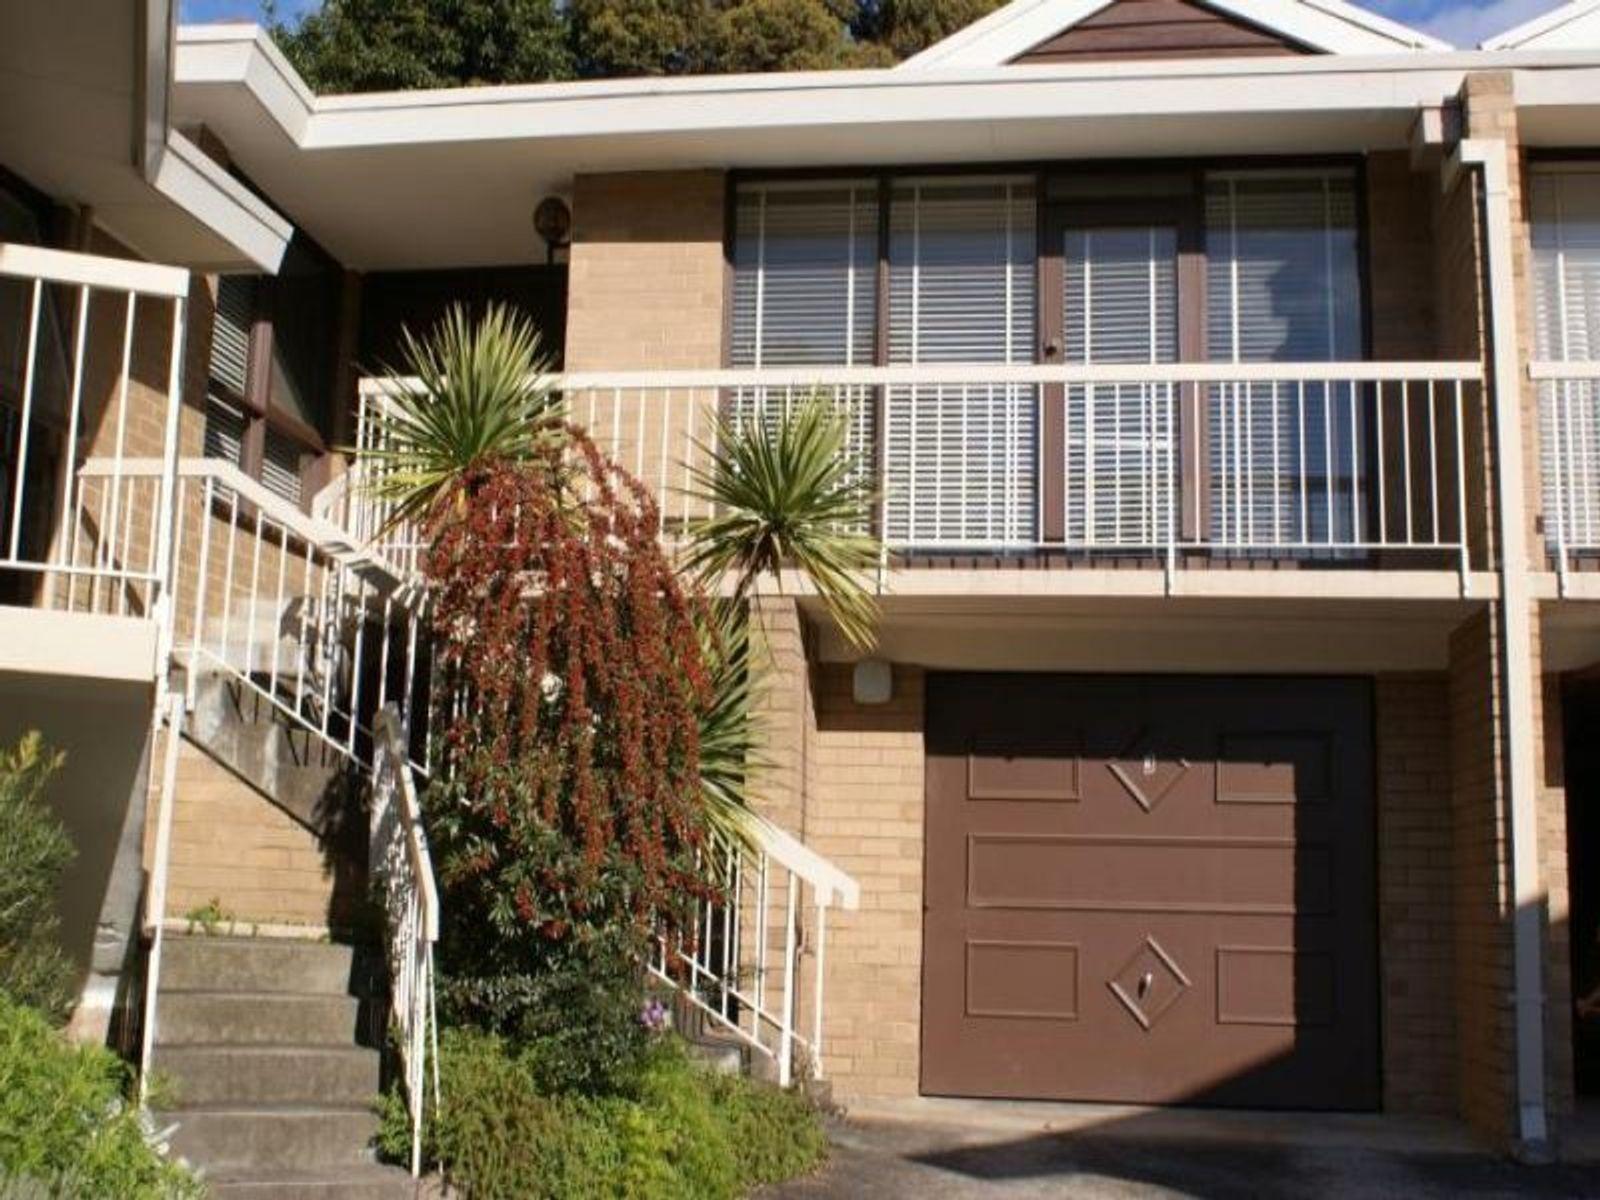 3/368 High Street Road, Mount Waverley, VIC 3149